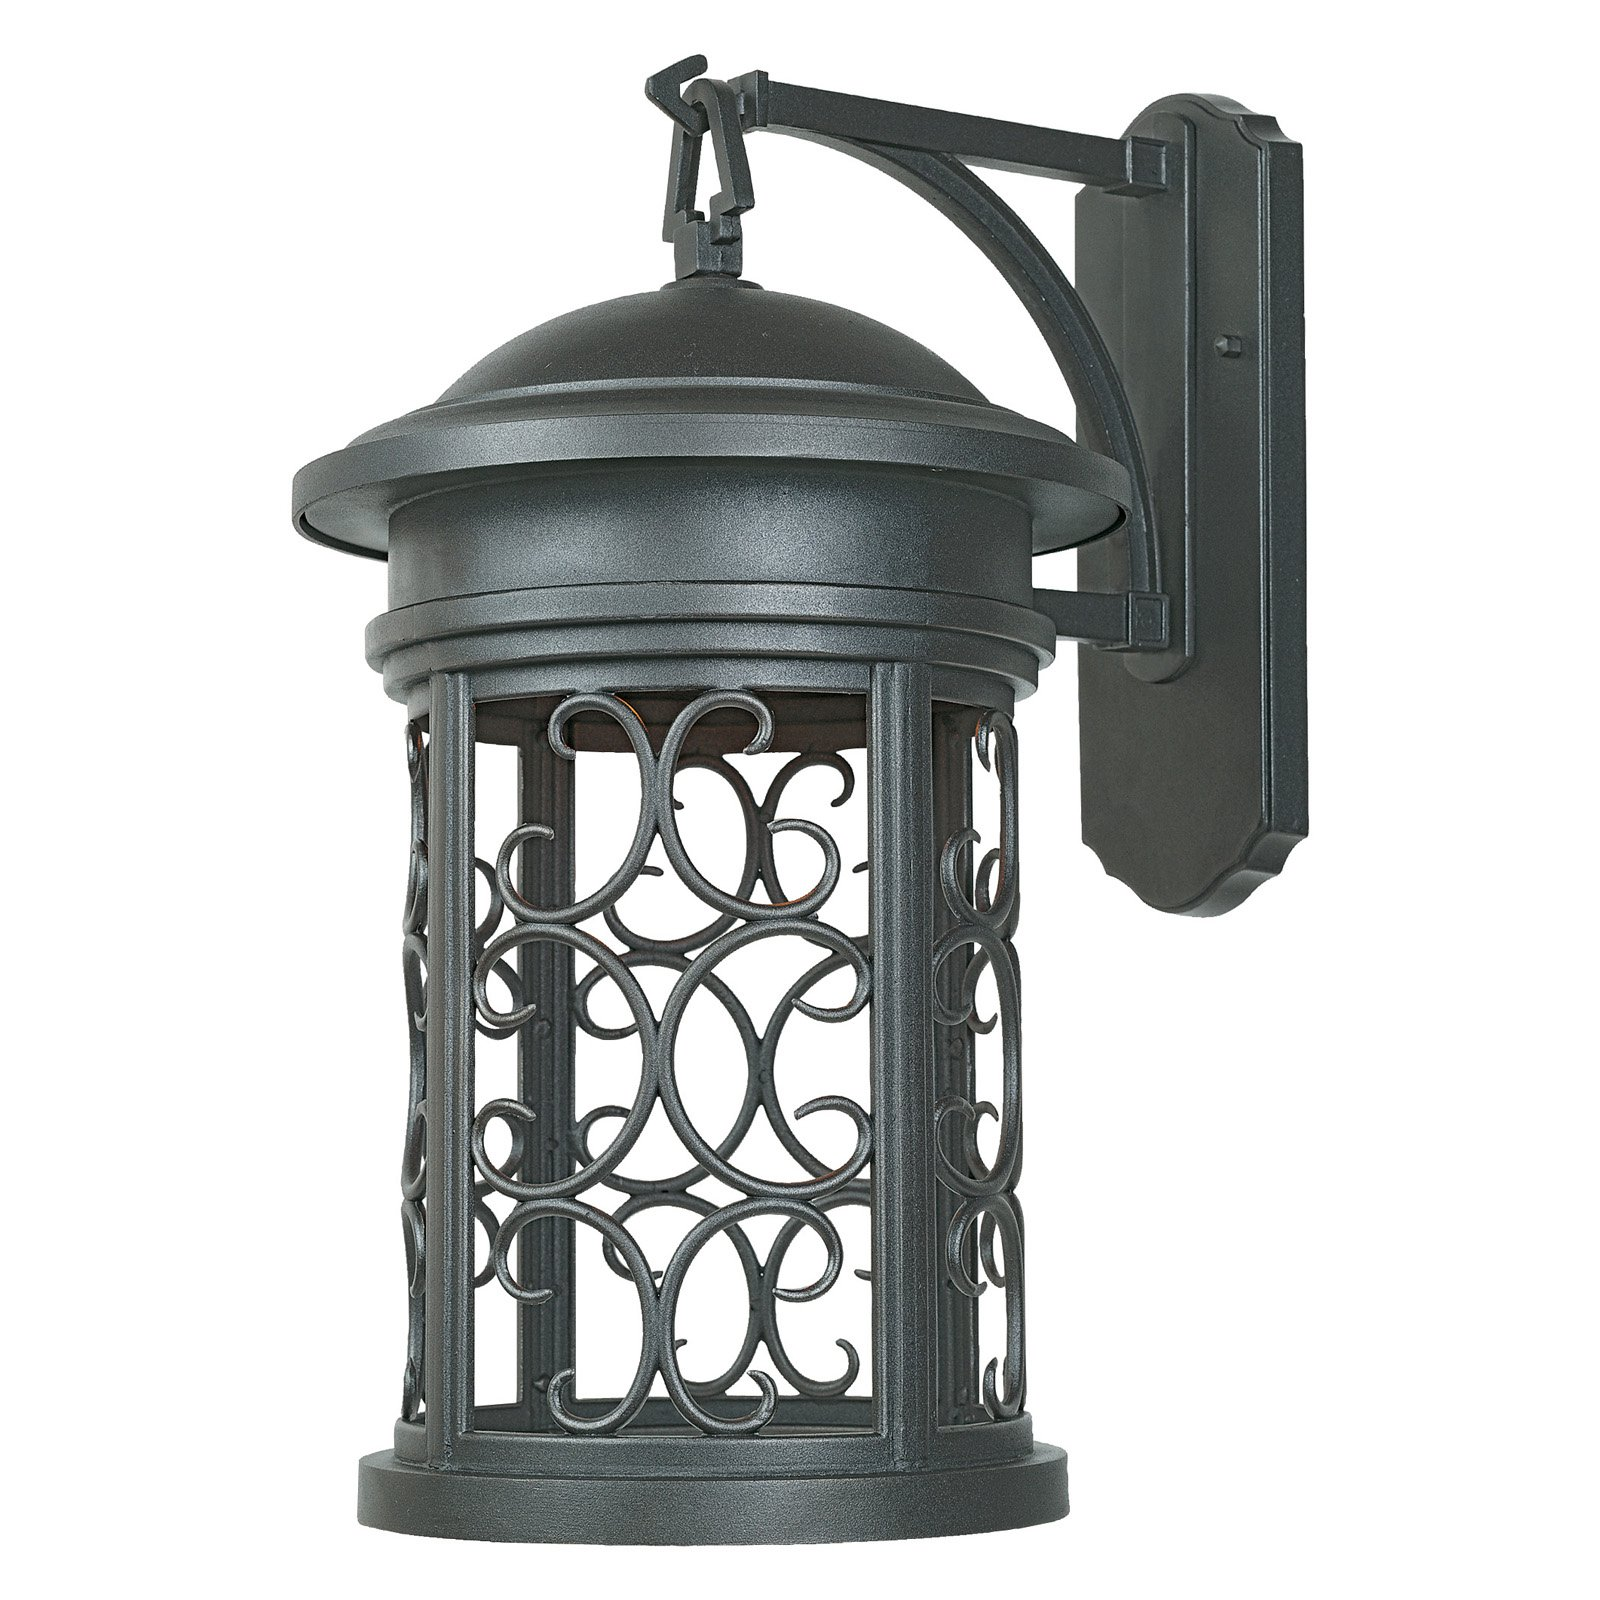 Designers Fountain Outdoor 31131 Ellington Dark Sky Wall Lantern